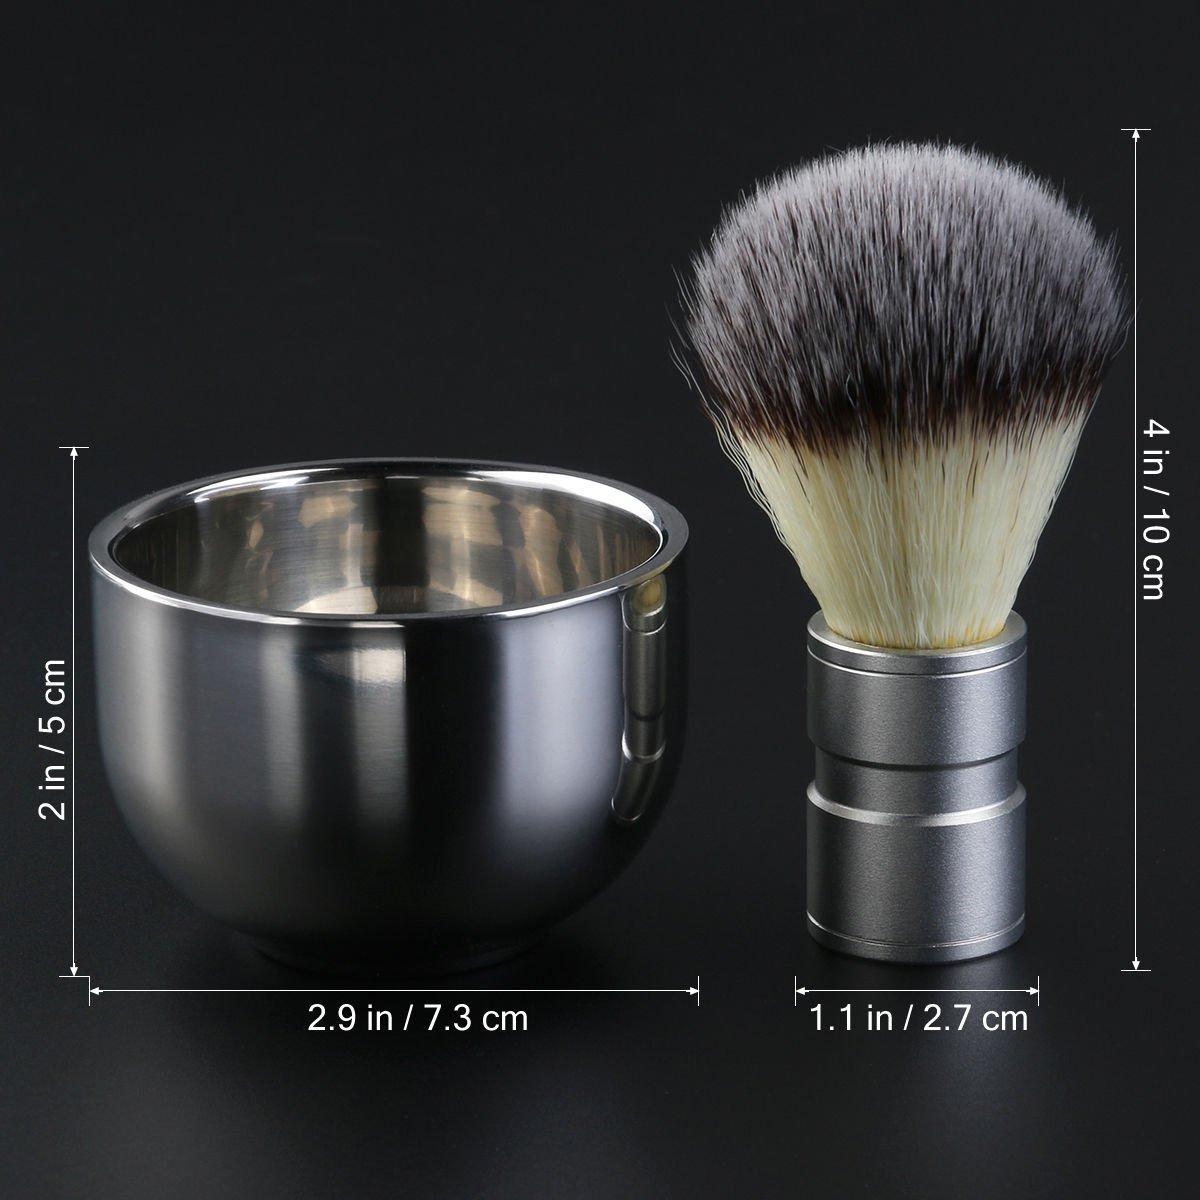 Gadgetzone® Stainless Steel Shaving Brush and Shaving Bowl Set. Turkish Shave Hot Shave Mens Grooming Kit Shaving Set for Men. Great Gift.